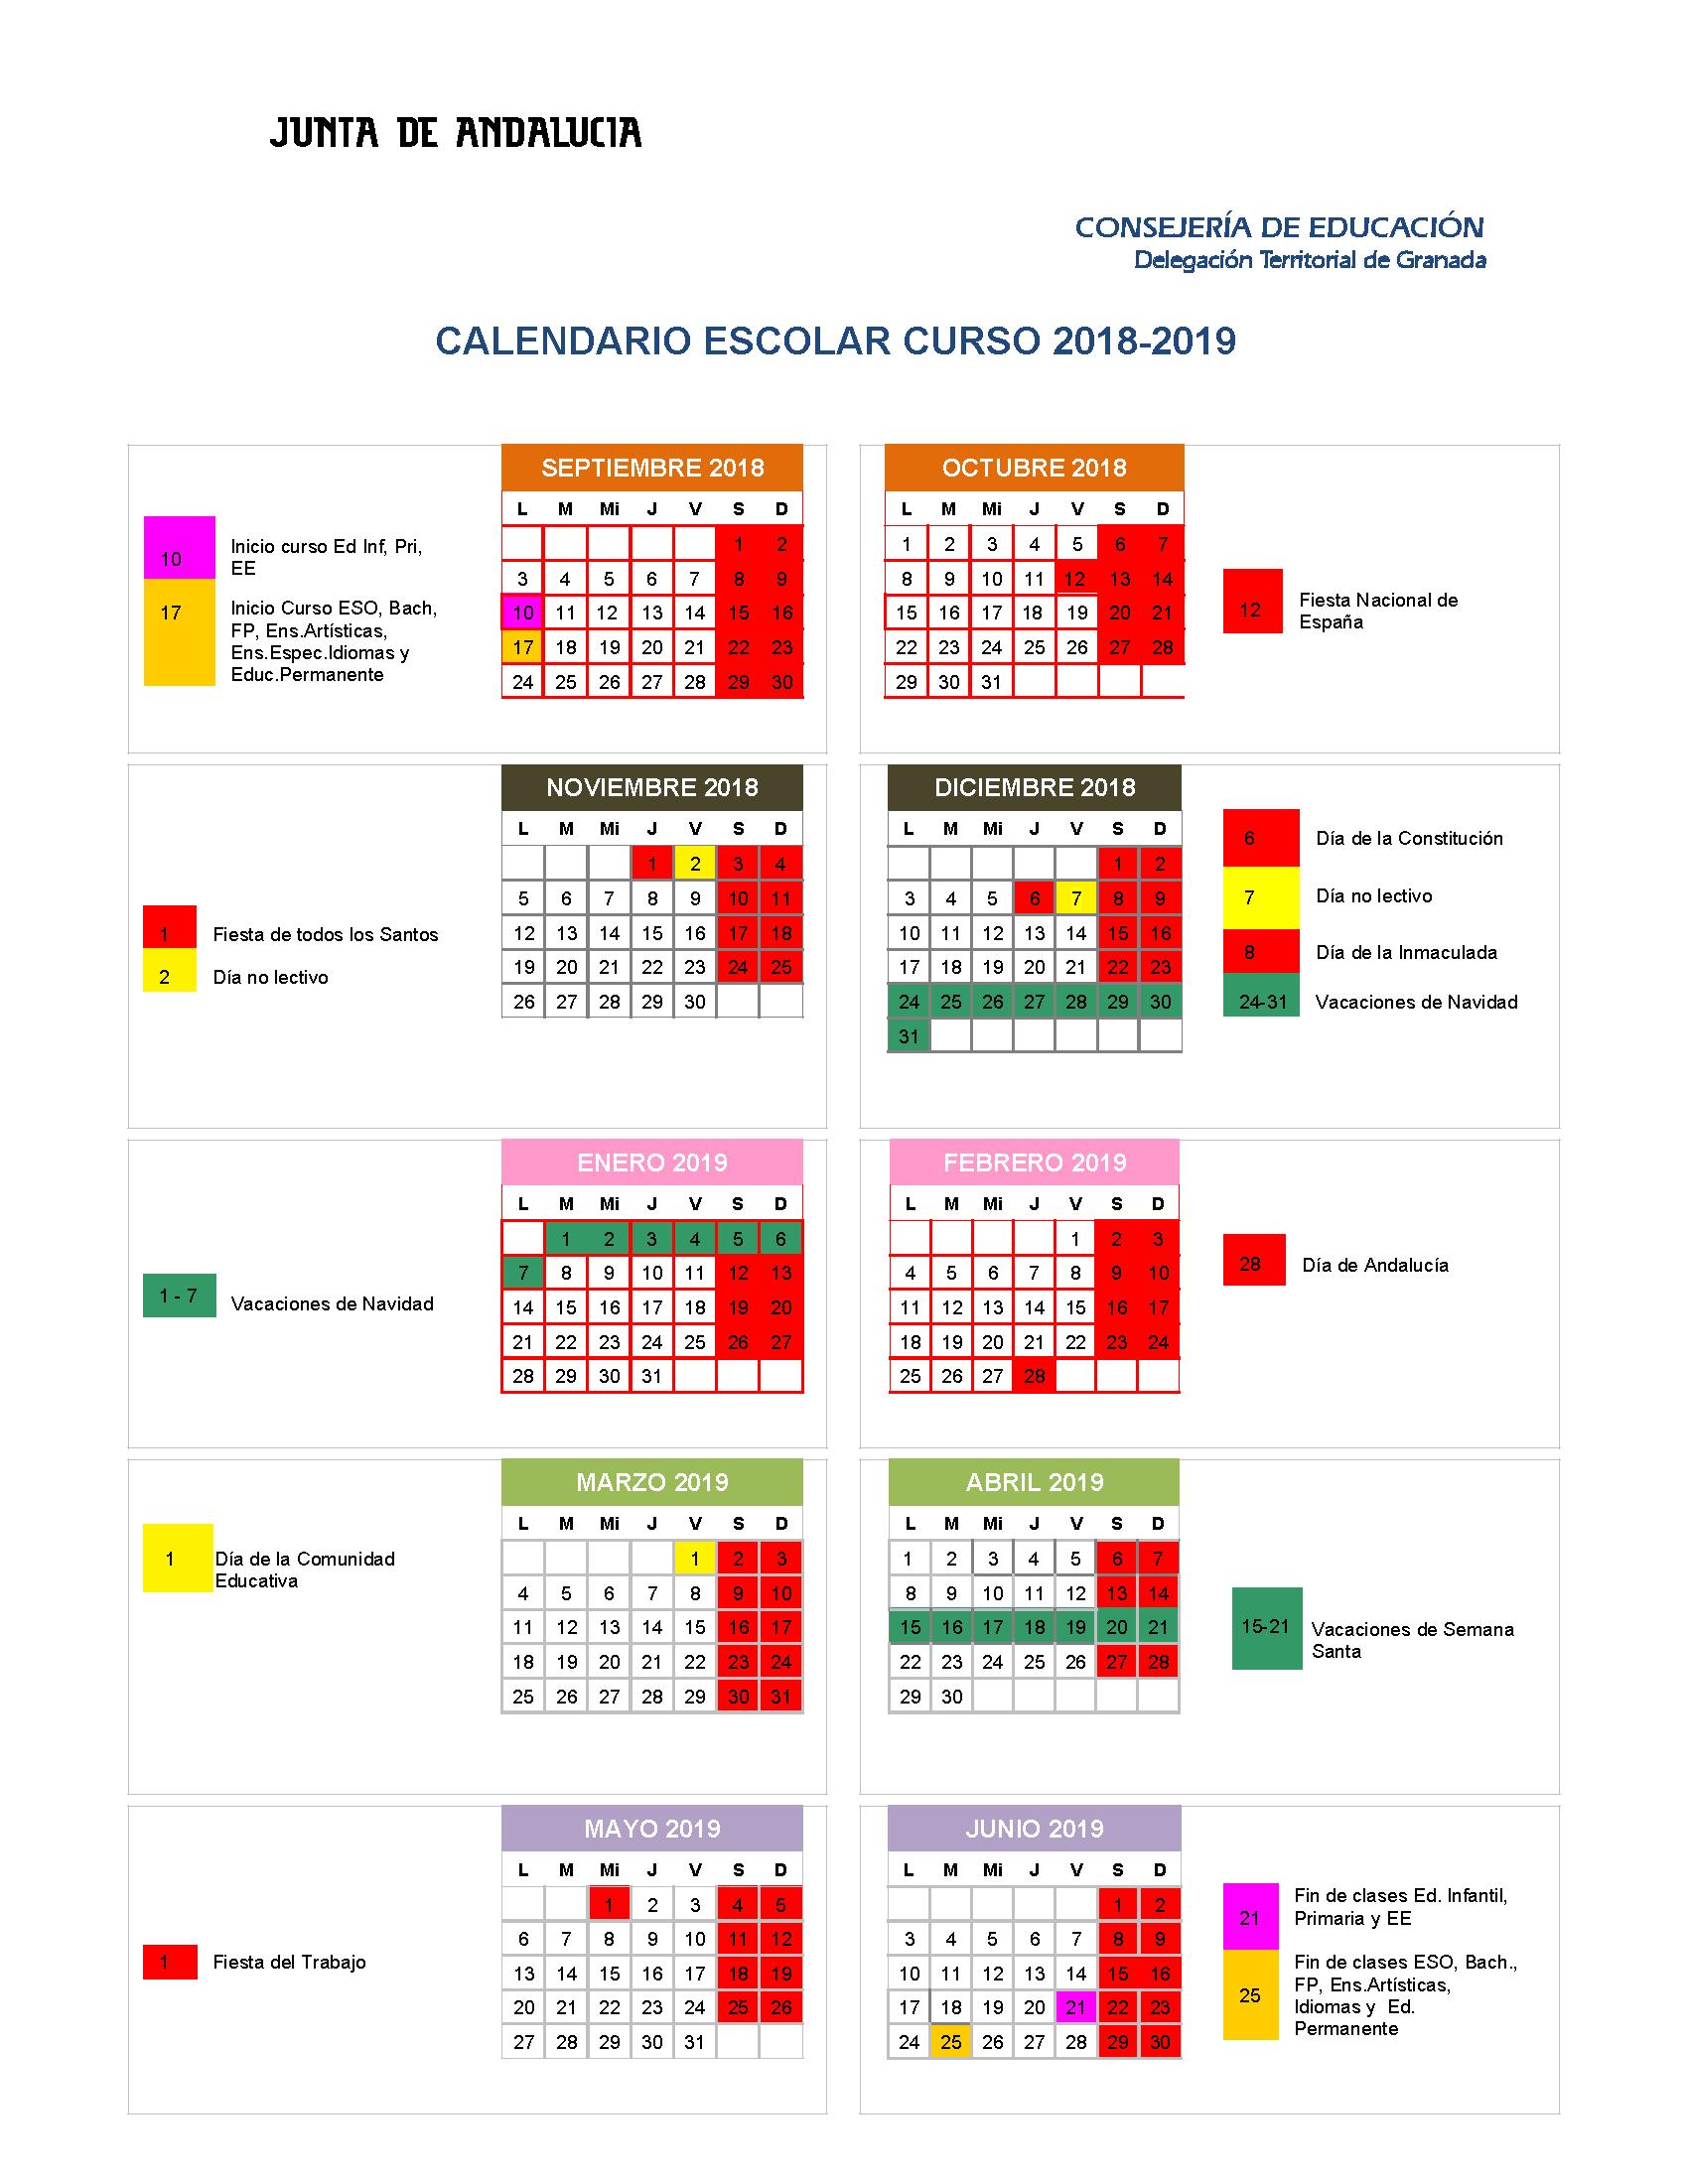 granada_calendario_escolar_2018_2019_0